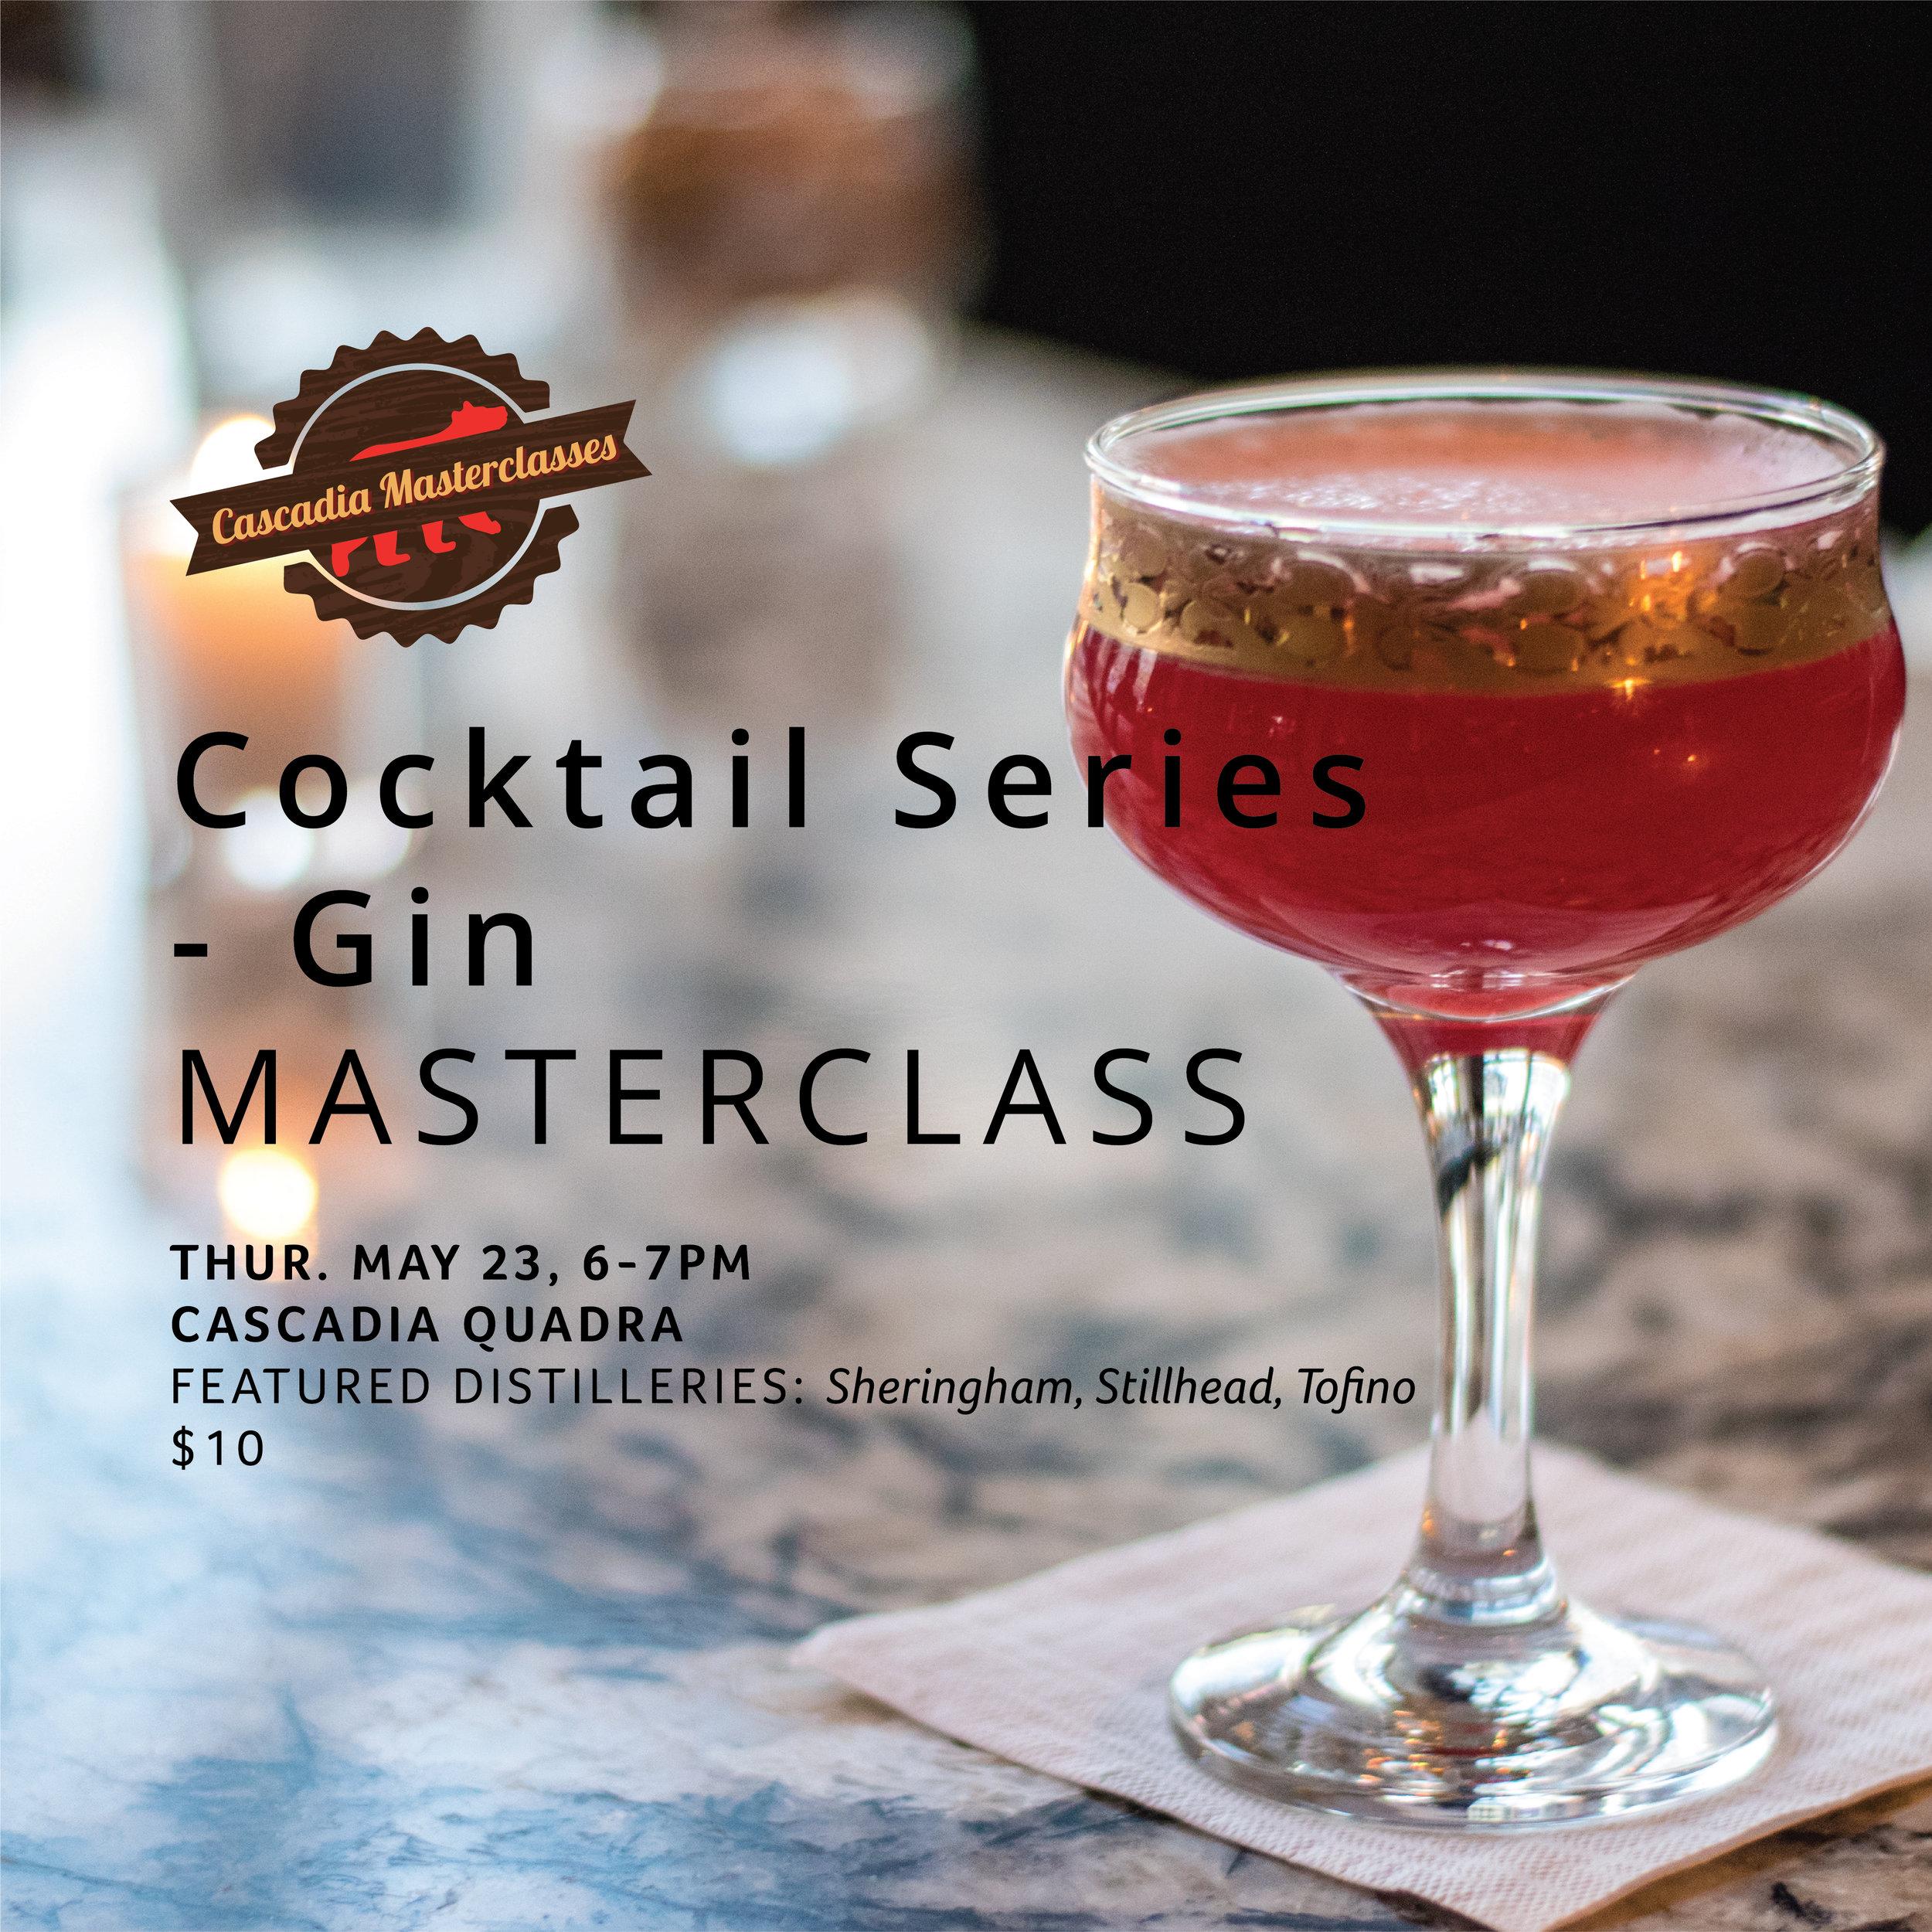 Cascadia Quadra Masterclass_CocktailSeries_May 2019_Web.jpg